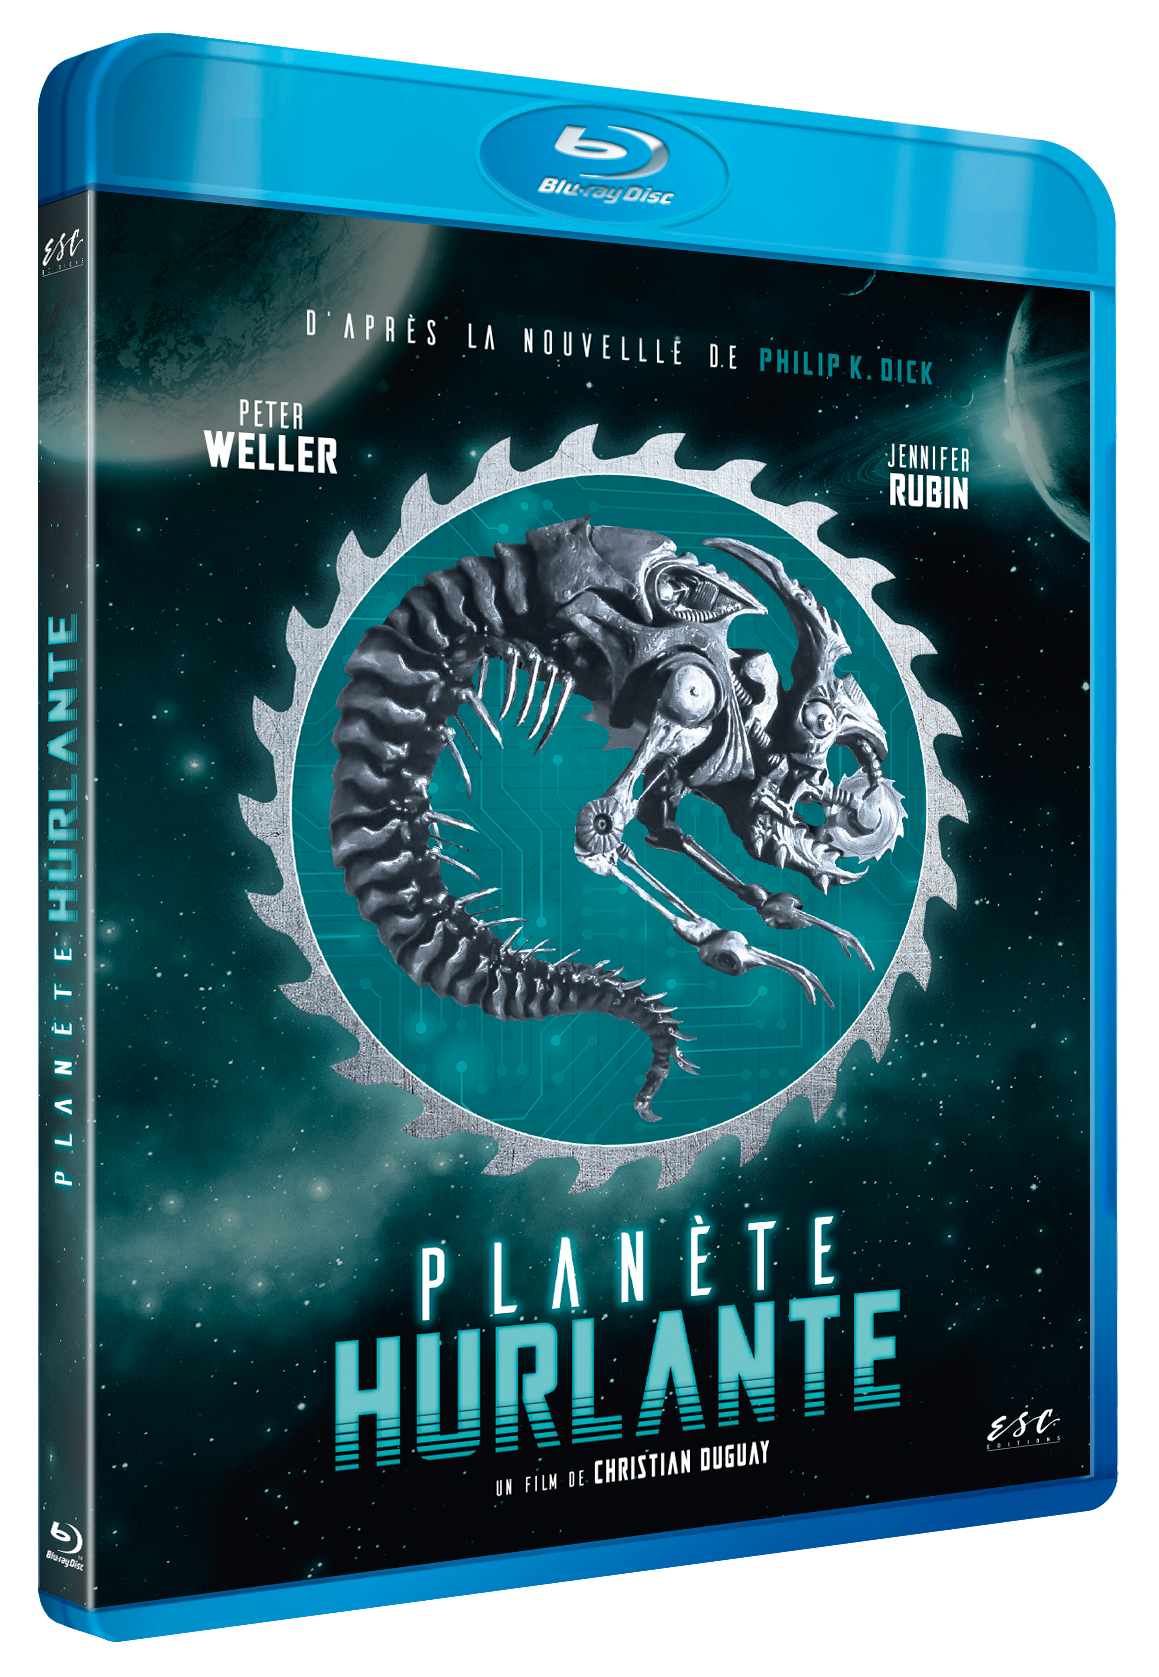 PLANETE HURLANTE - BRD